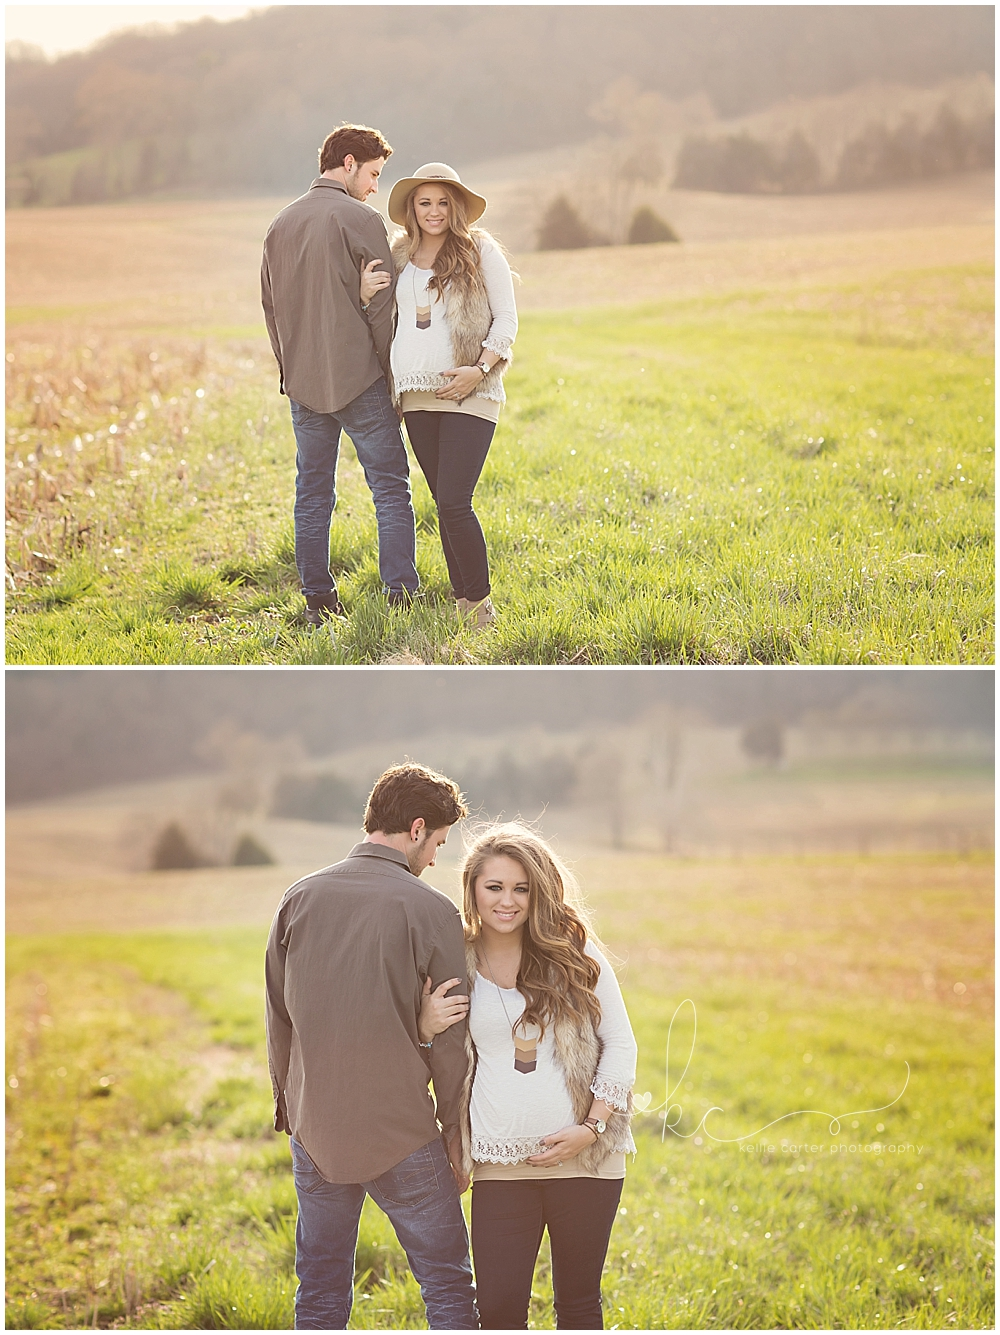 Kellie Carter Maternity Photographer KY_0001